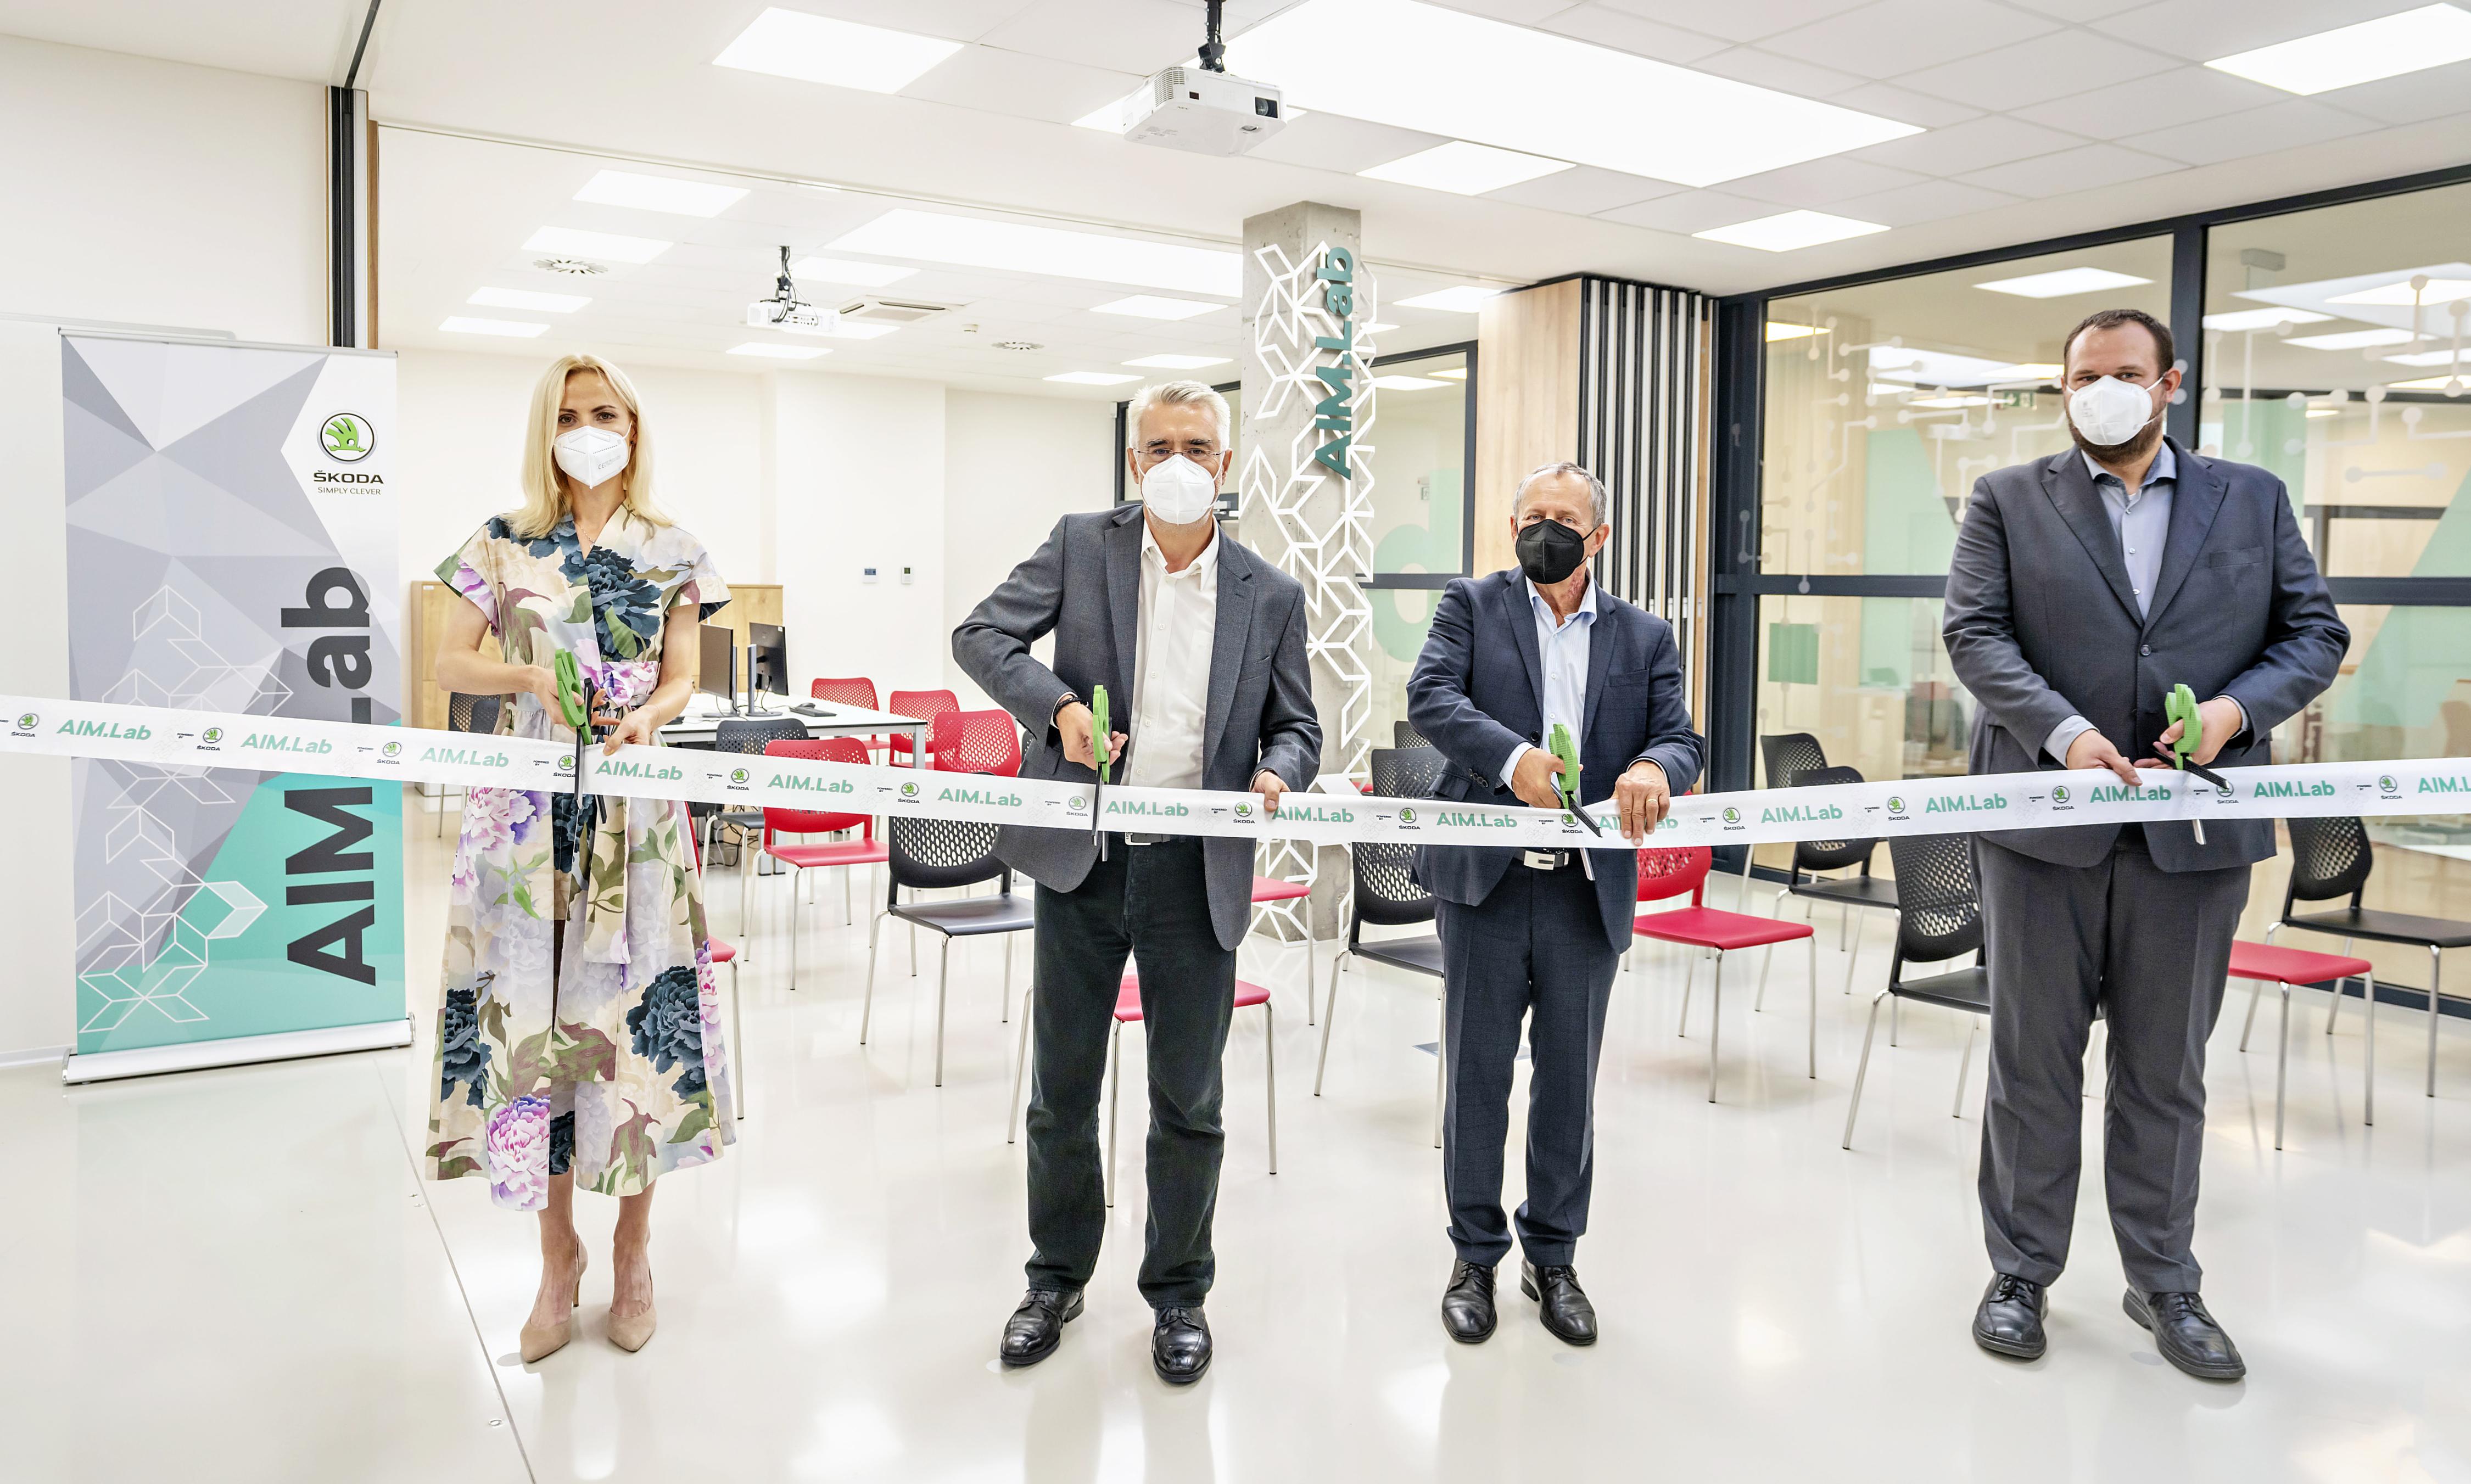 SKODA AUTO opens AIM.Lab in collaboration with the Technical University of Ostrava VSB-TUO - Image 4